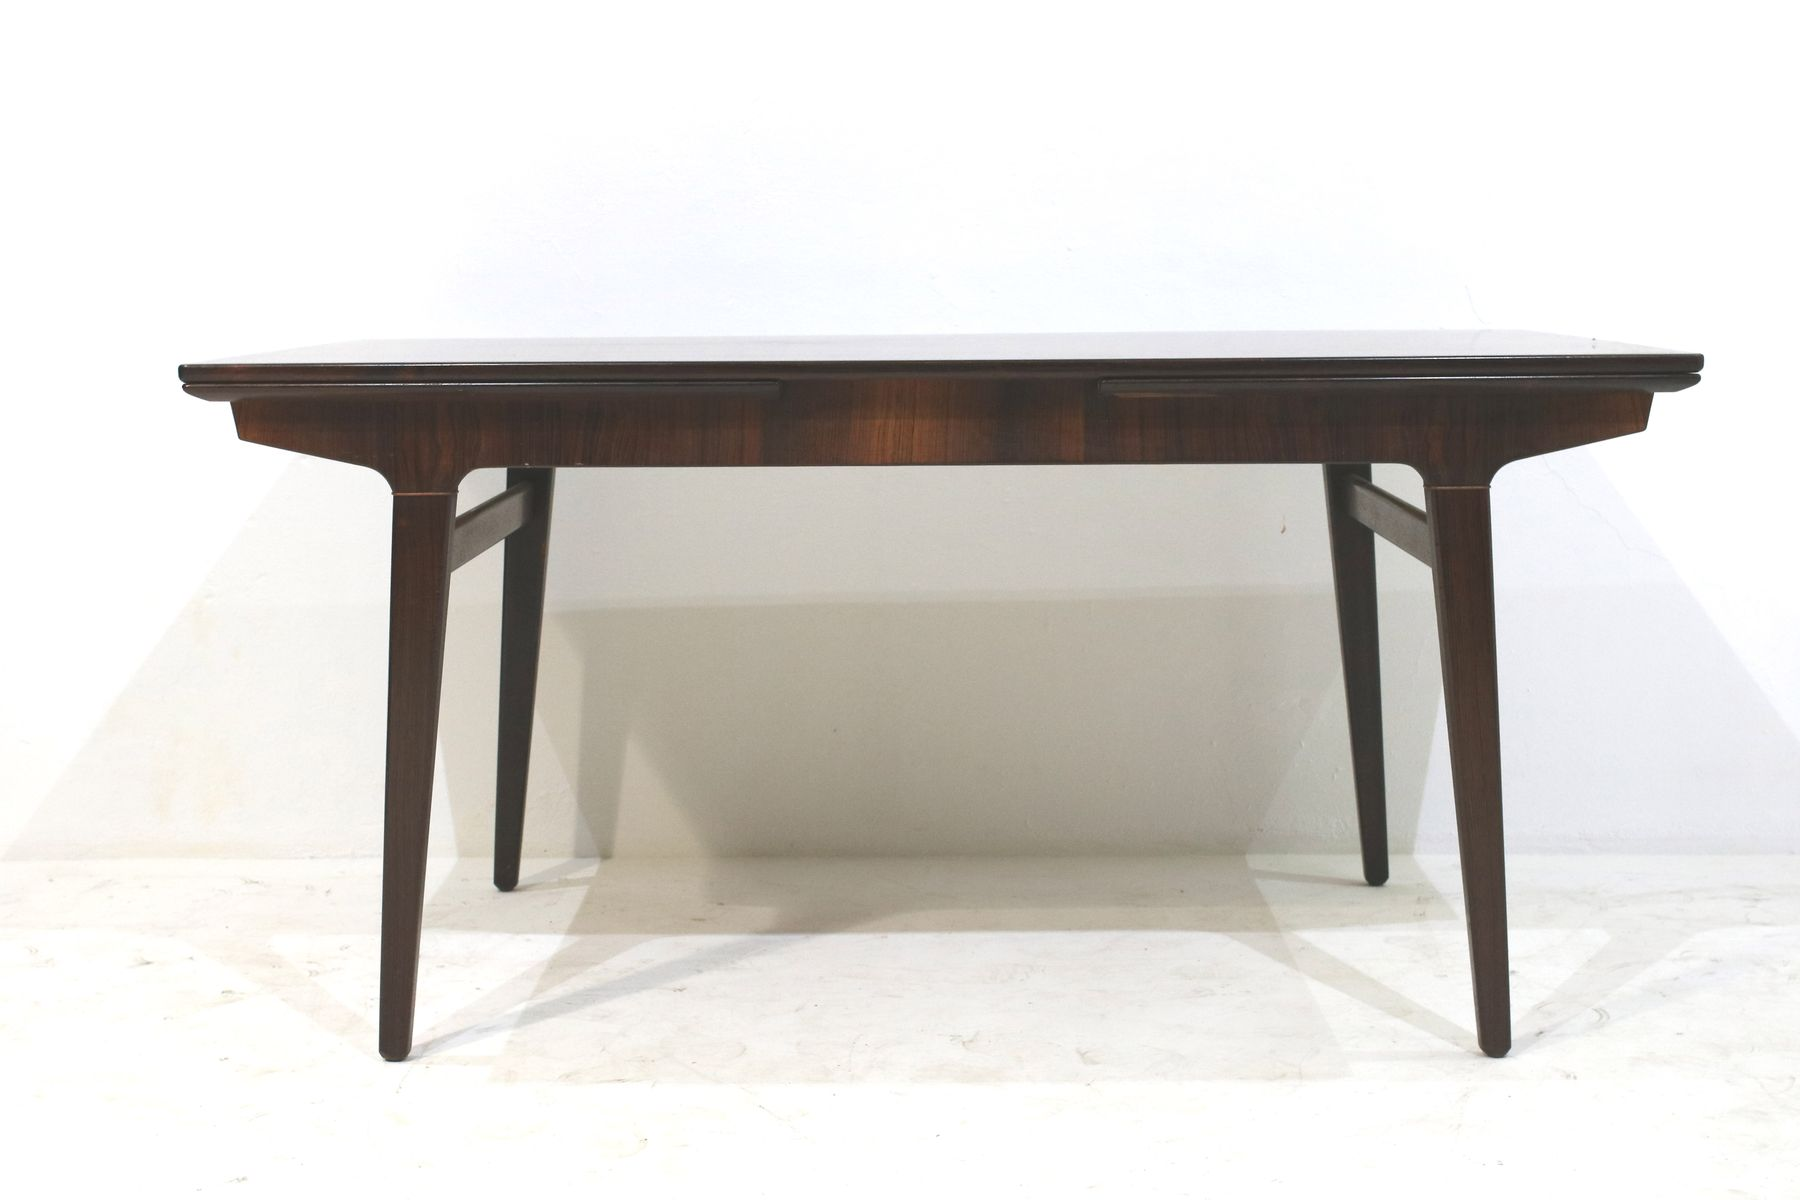 table de salle manger extensible vintage par johannes andersen en vente sur pamono. Black Bedroom Furniture Sets. Home Design Ideas